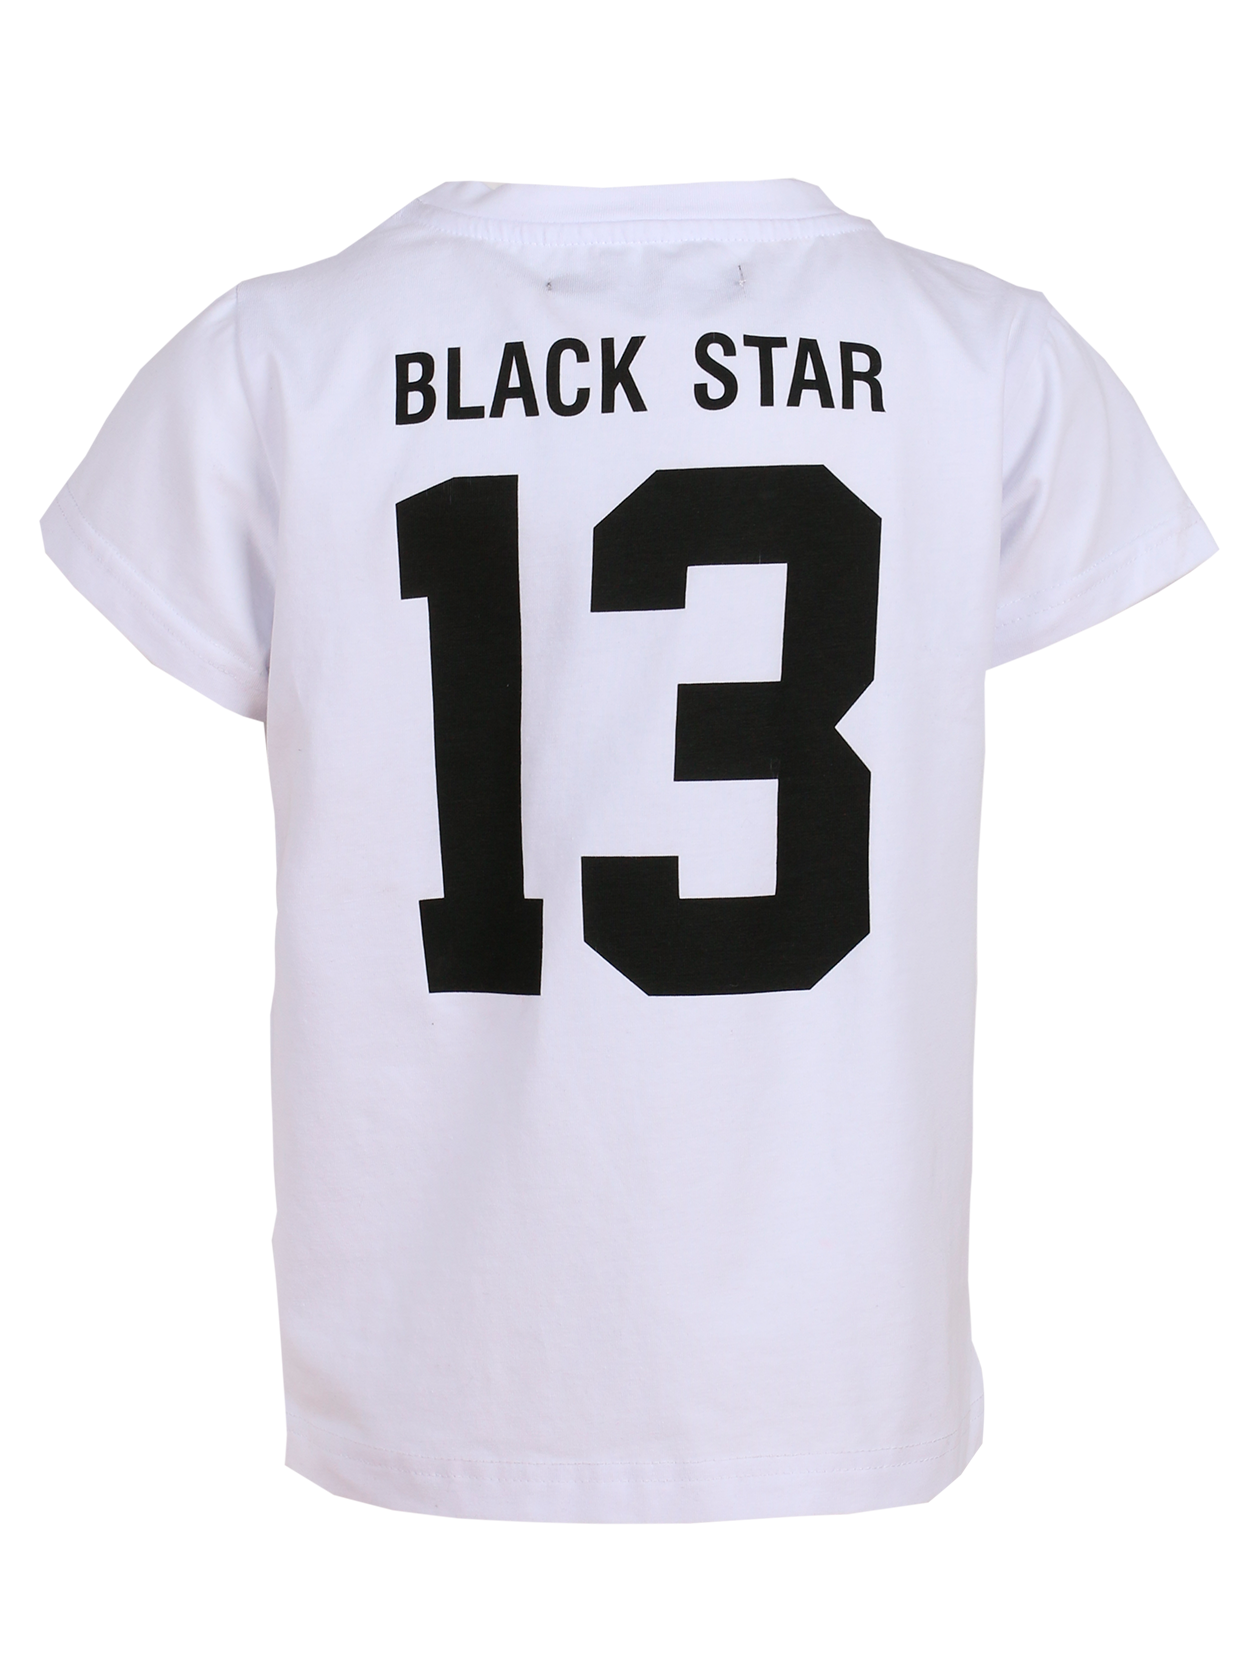 Футболка детская BLACK STAR 13